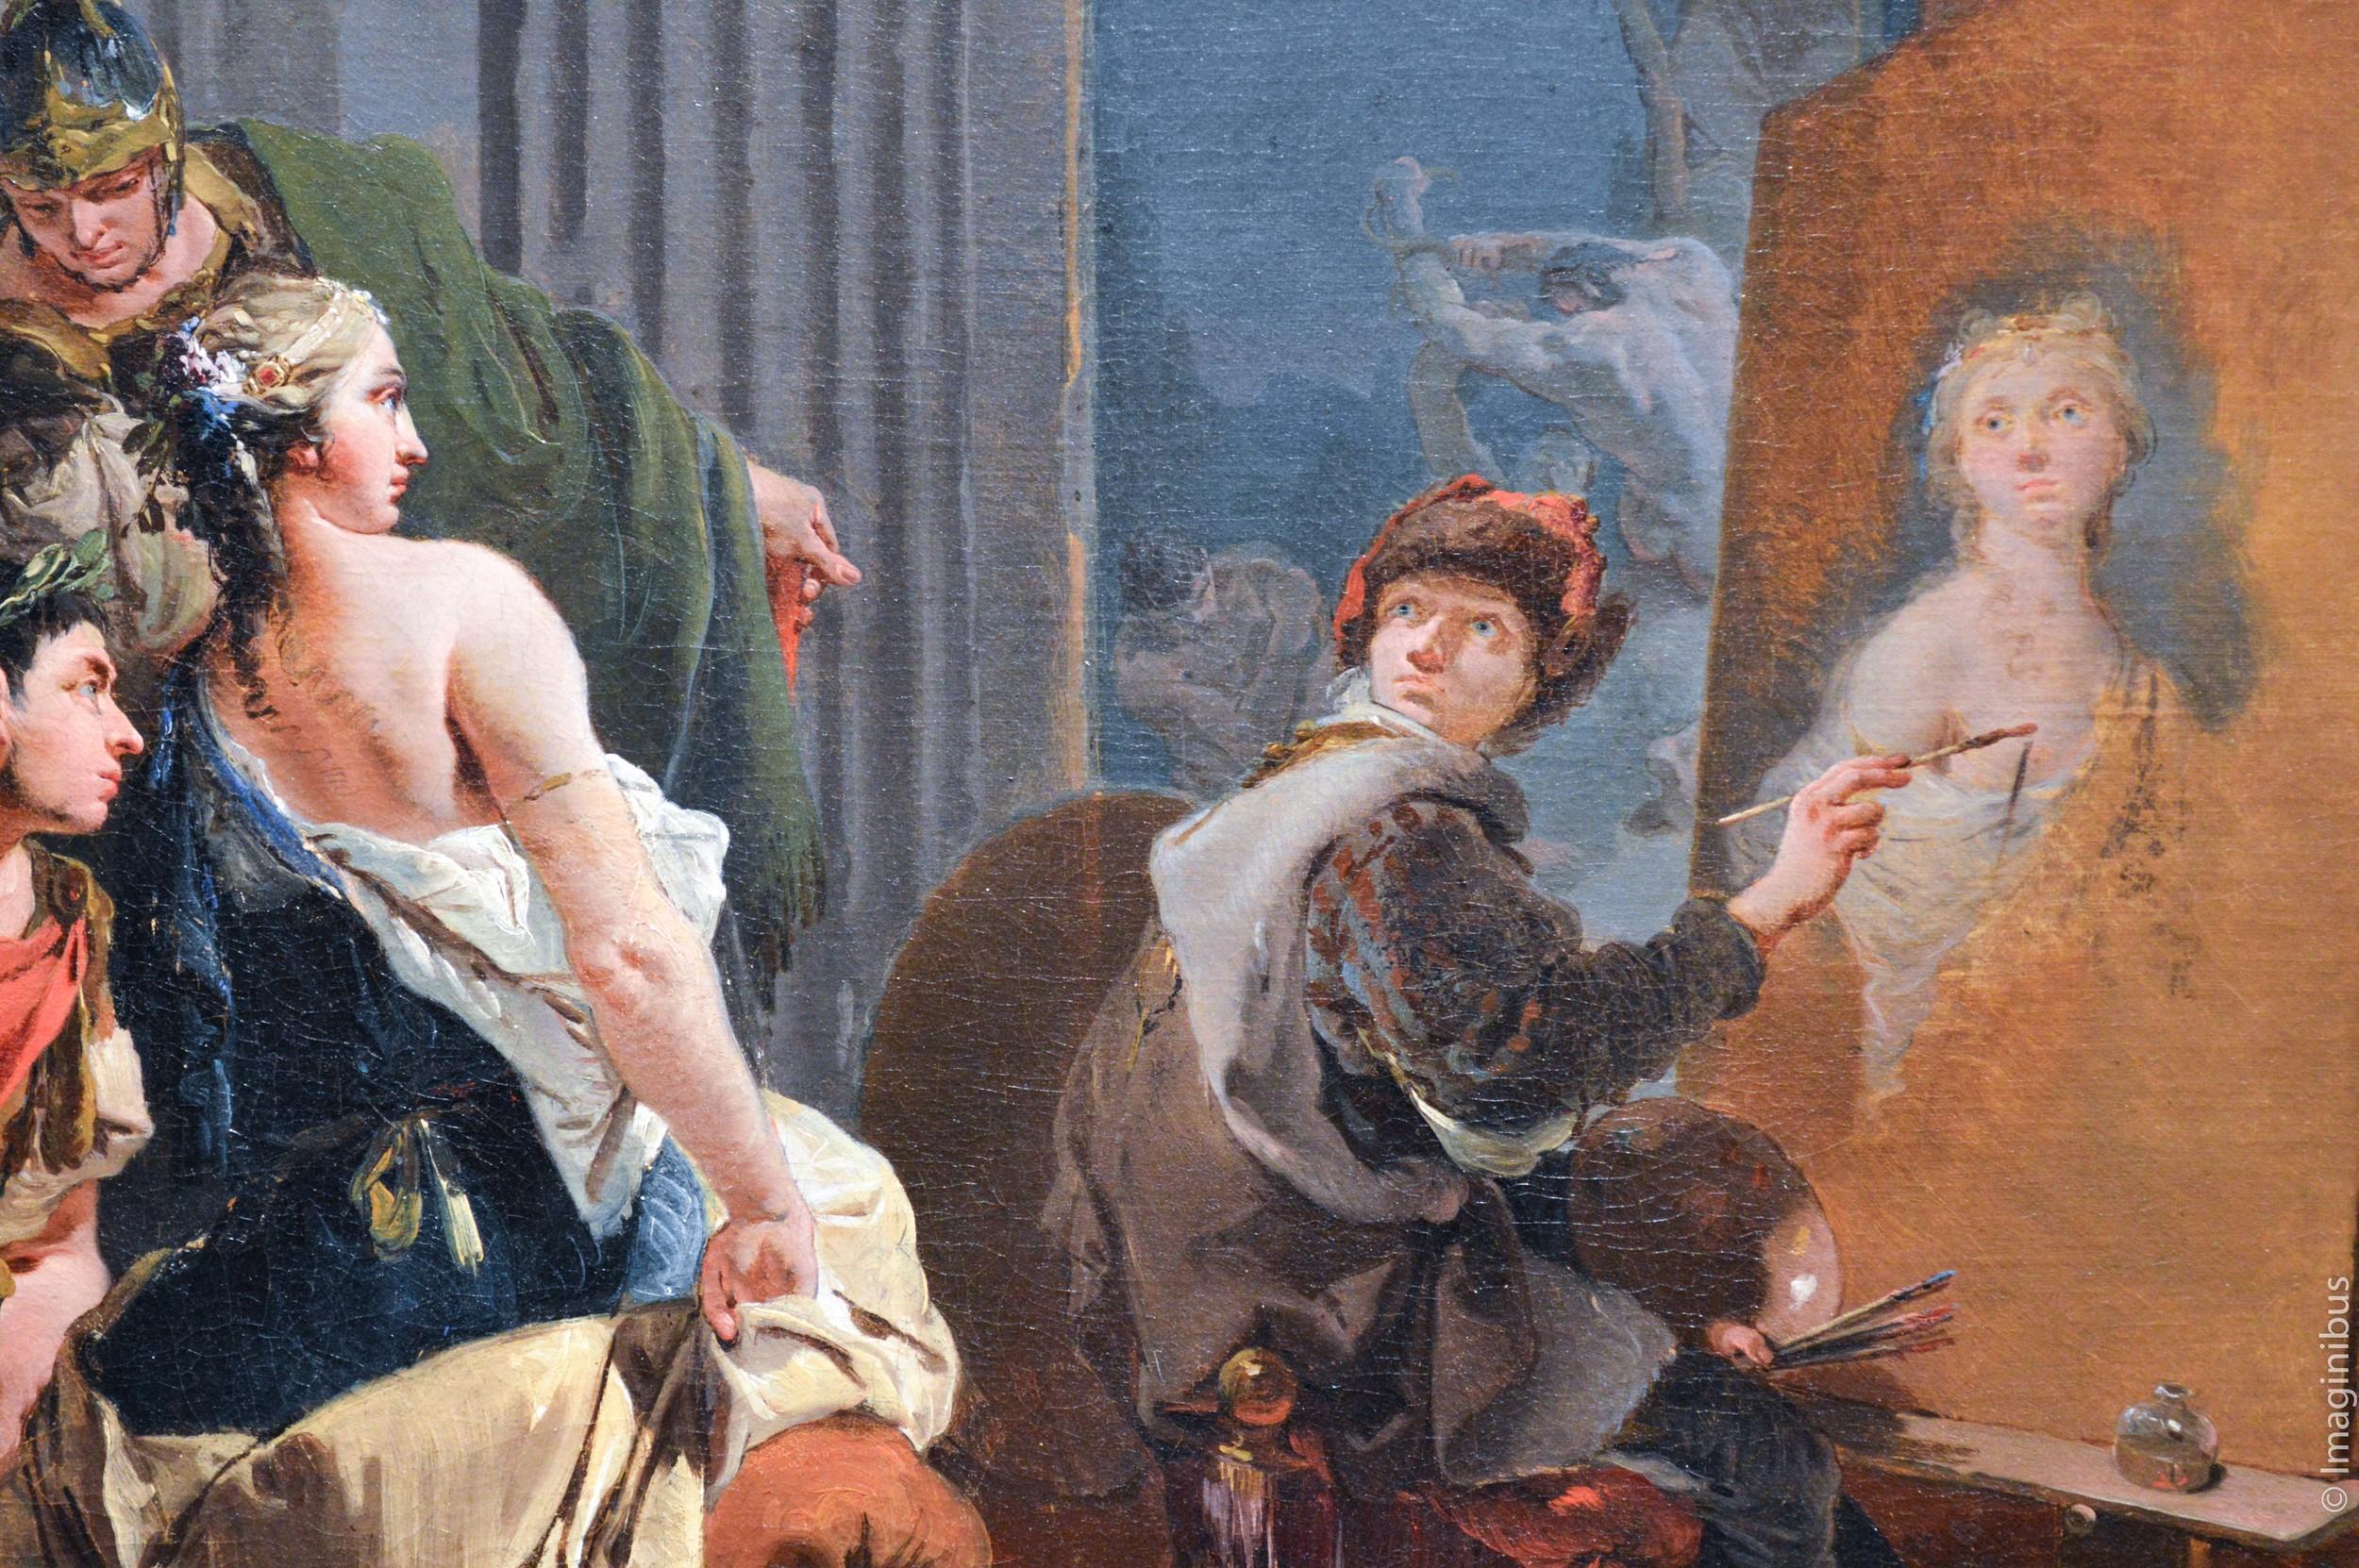 Montreal Museum of Fine Arts, Tiepolo, Apelles Painting the Portrait of Campaspe, Condesa de Castelblanco,